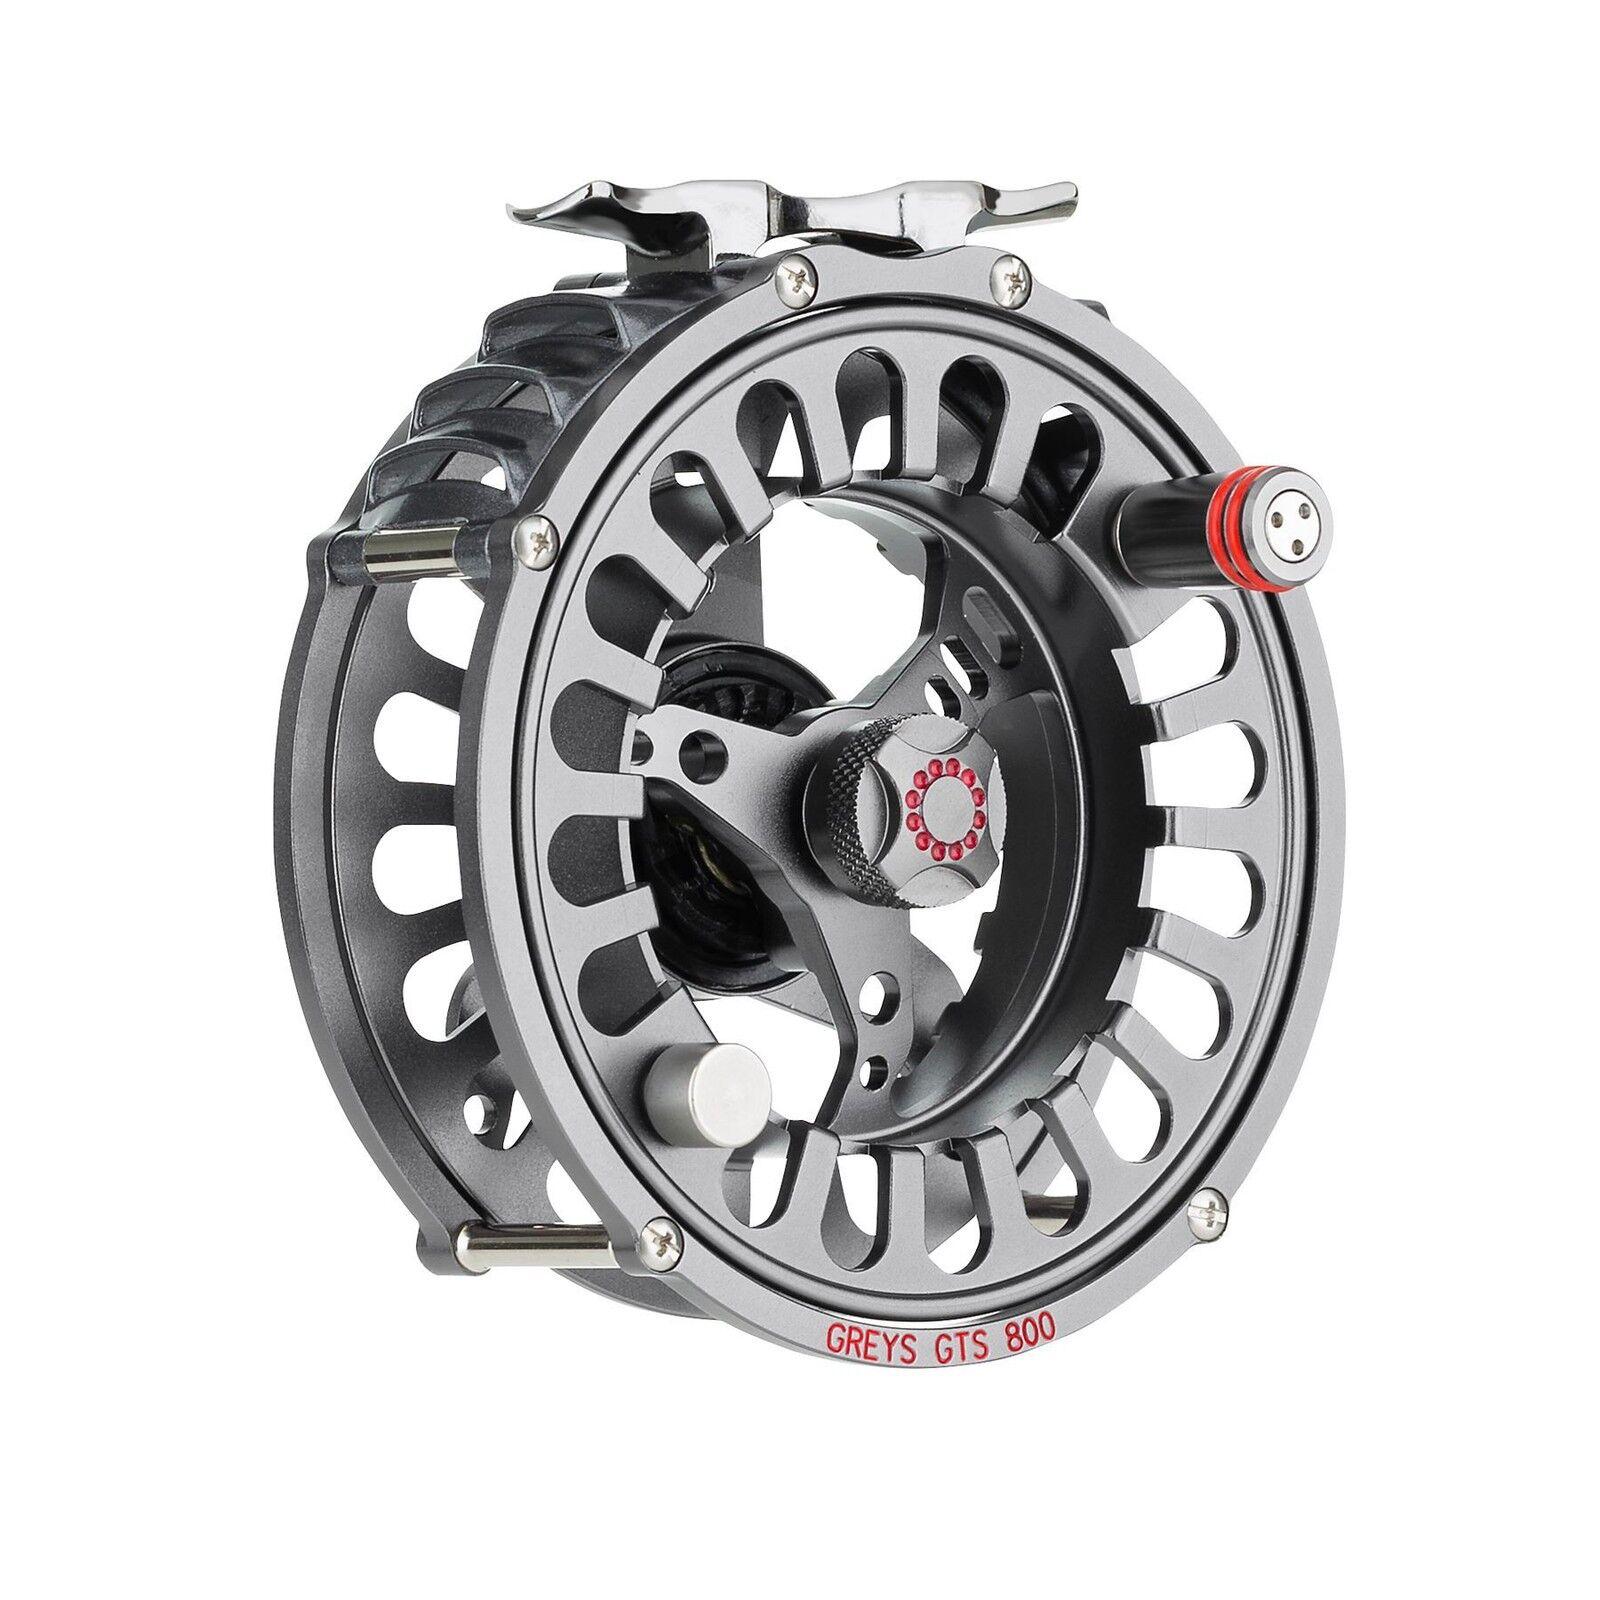 griss GTS800  7 8 1404537 Carrete de pesca con mosca